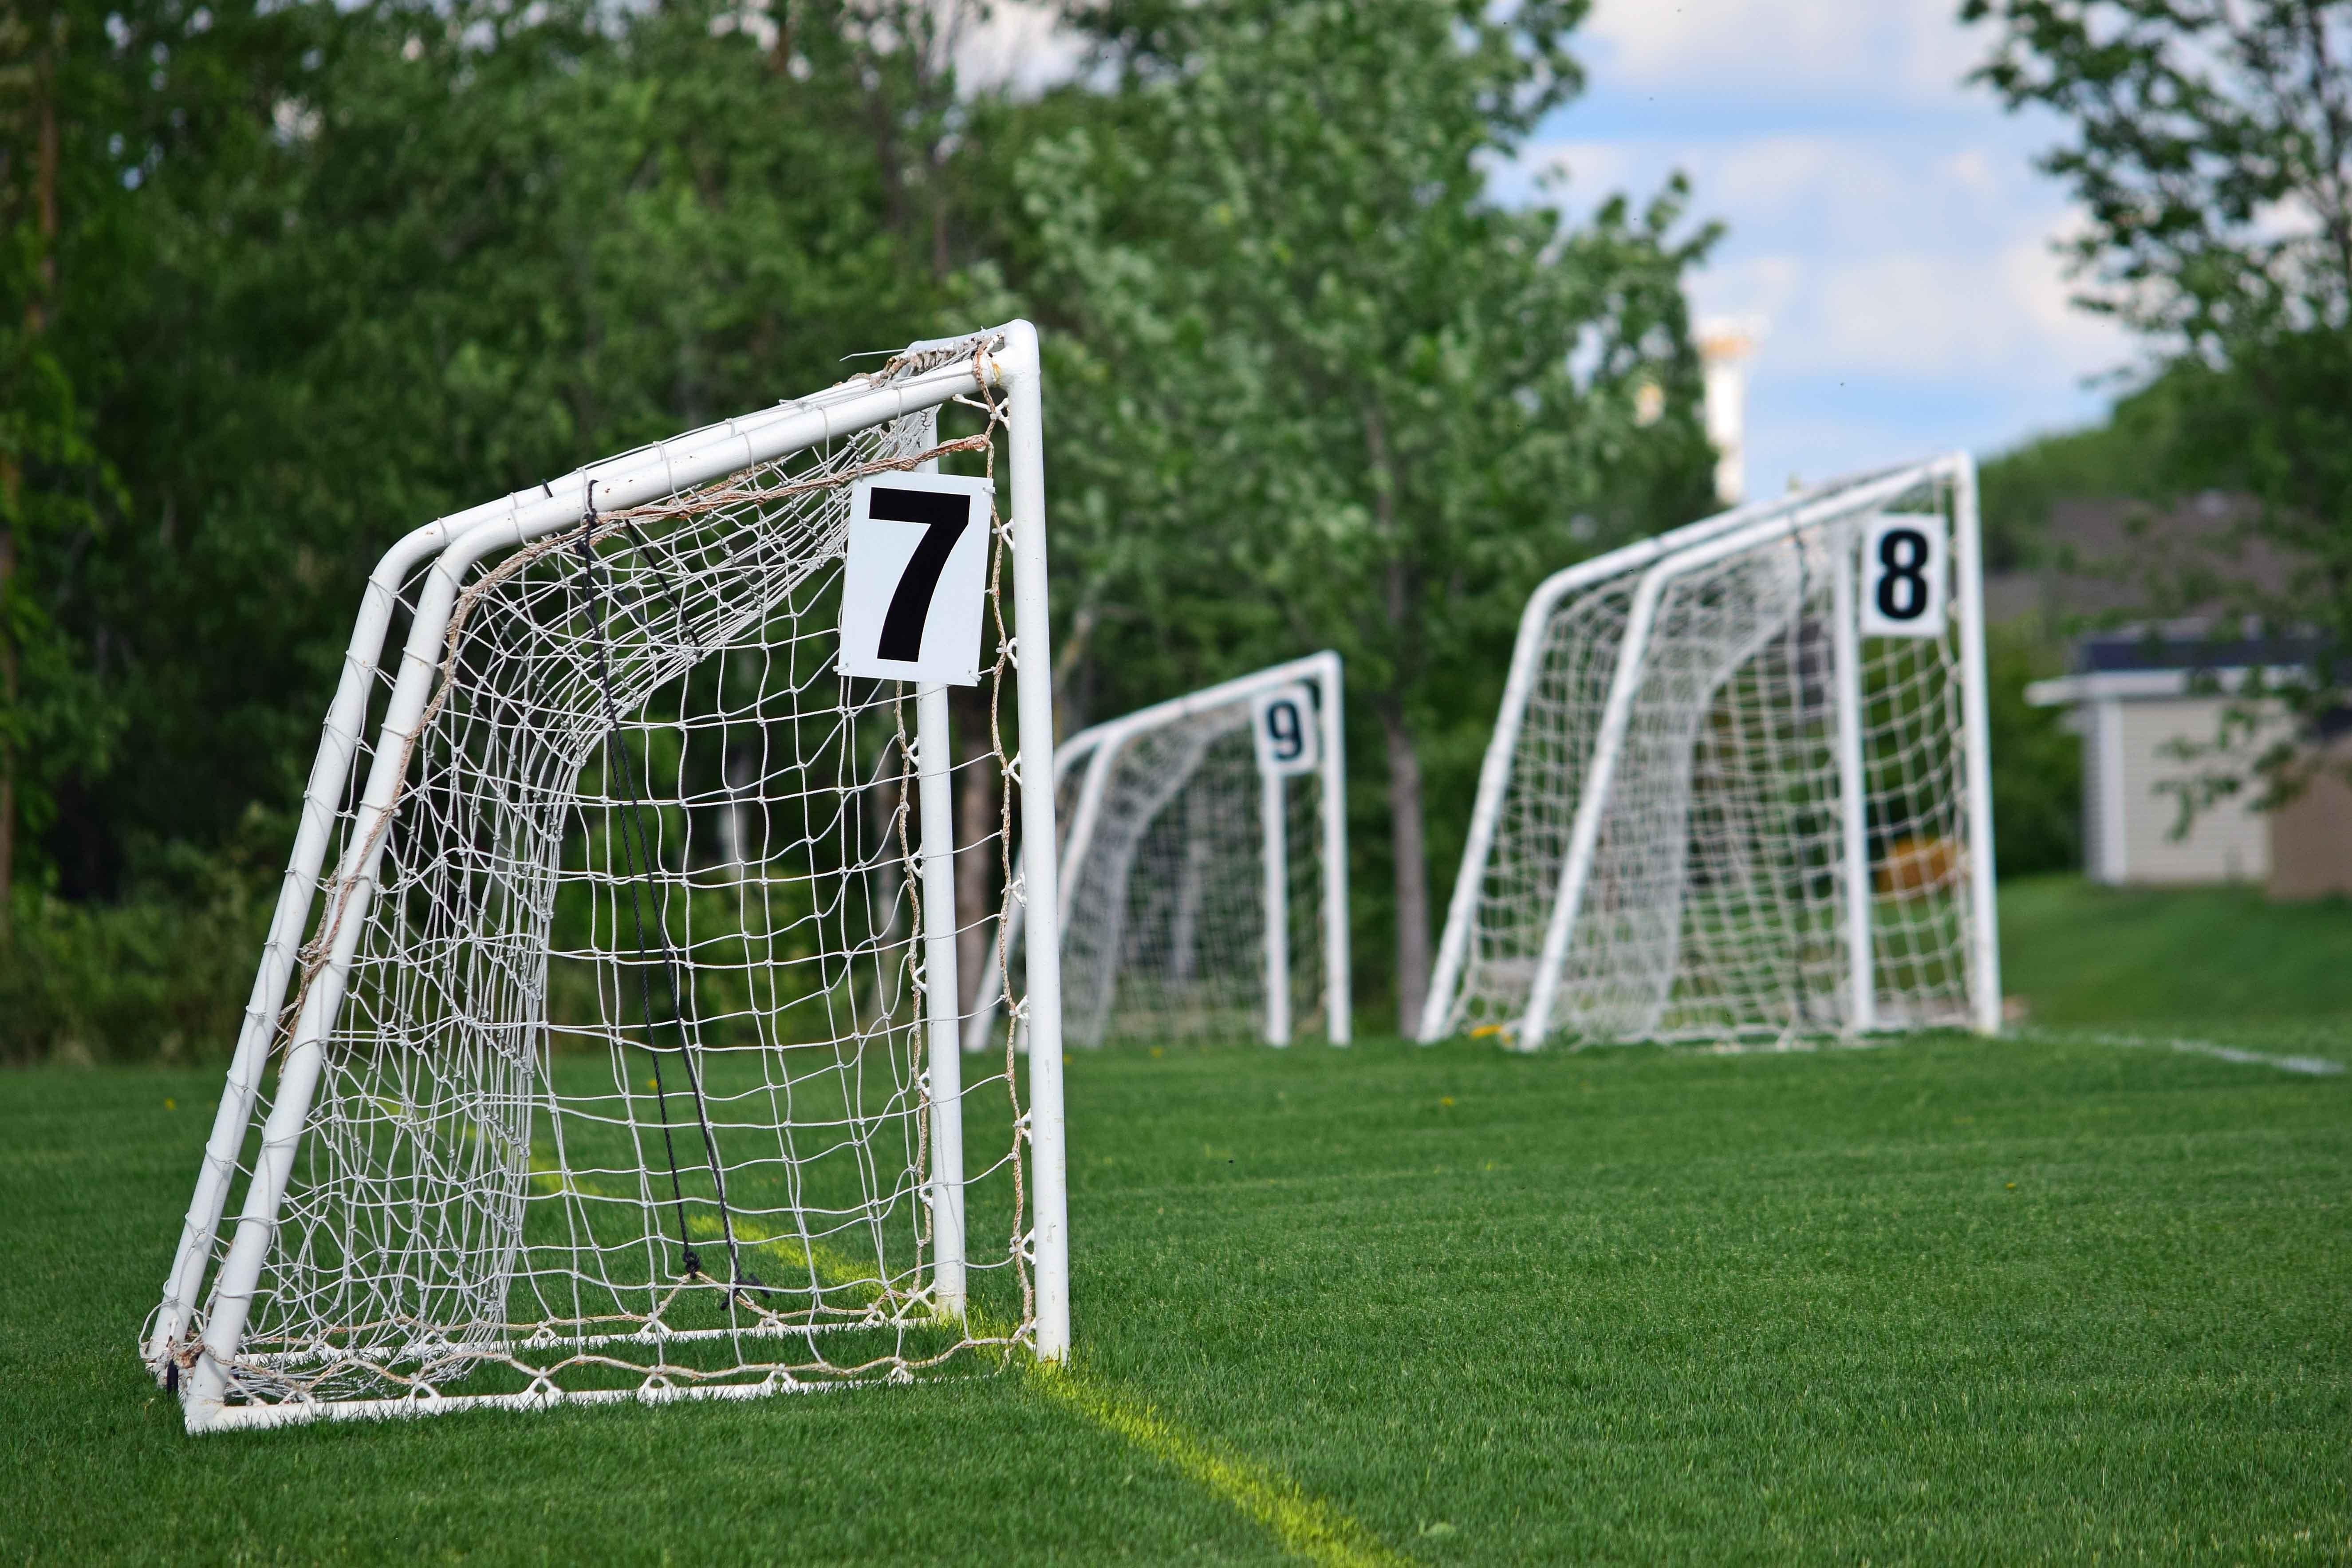 Free stock photo of soccer goal